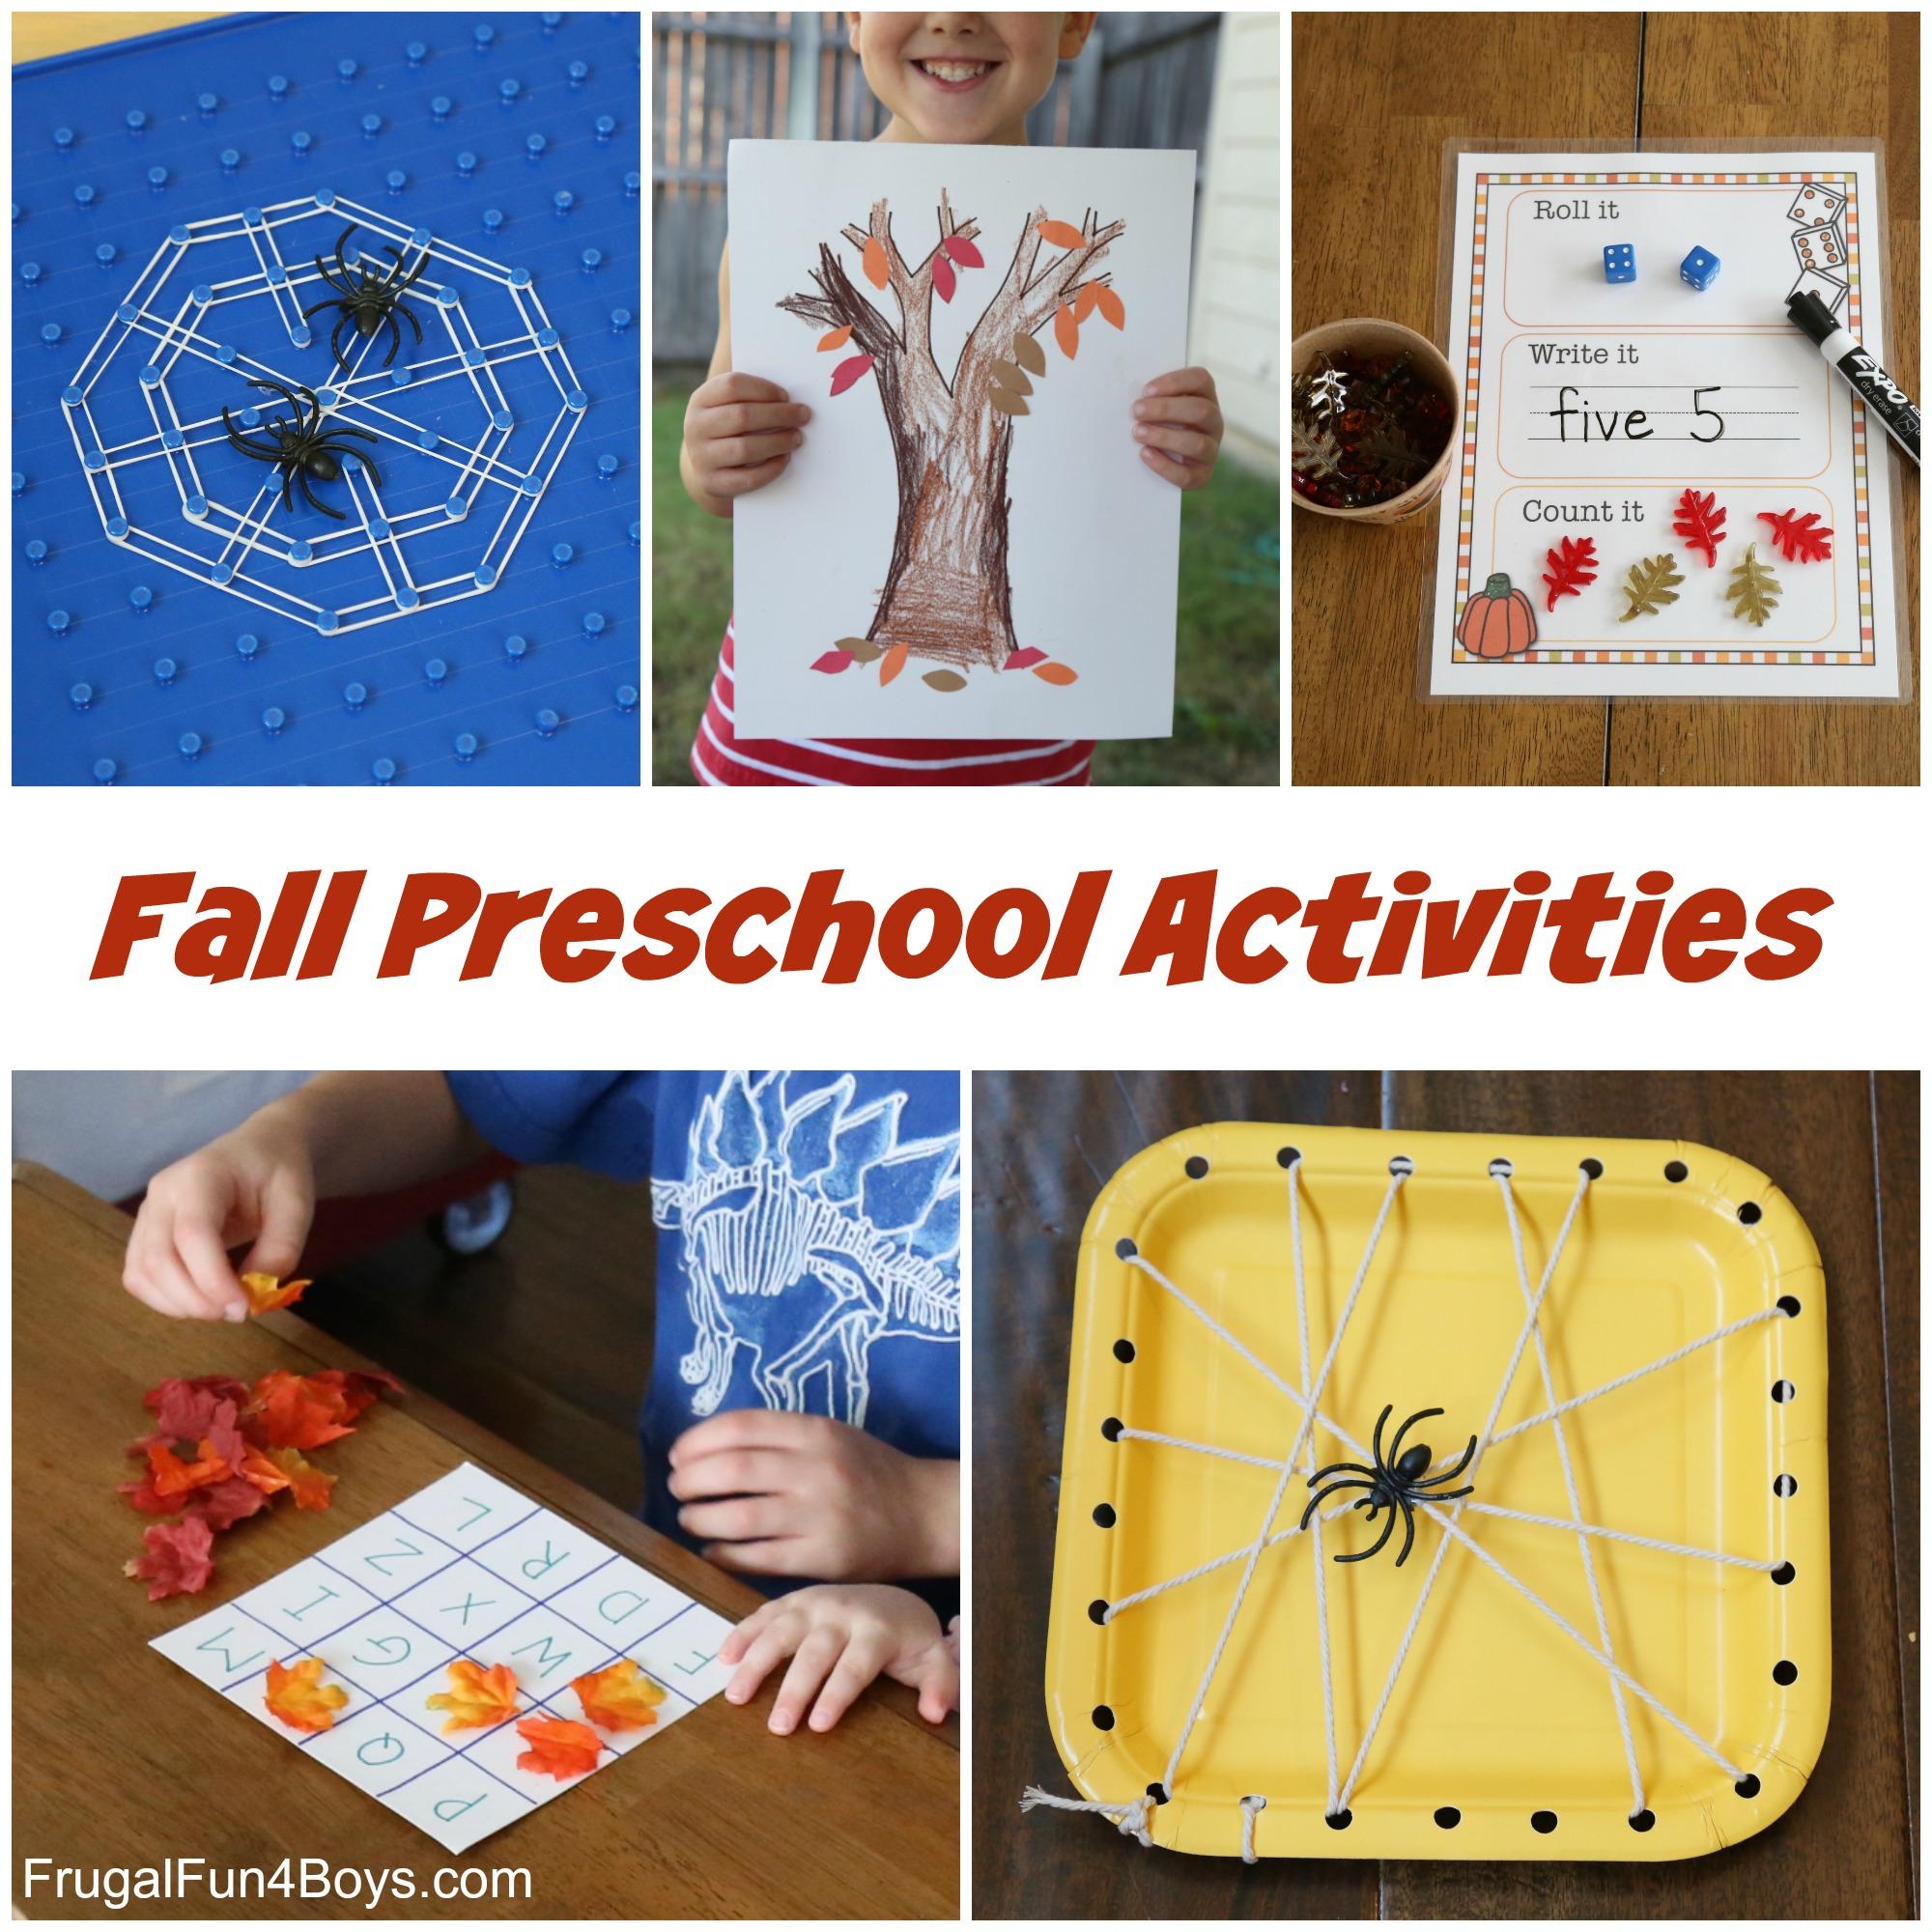 Fall Preschool Activities - Fine Motor, Alphabet, and More